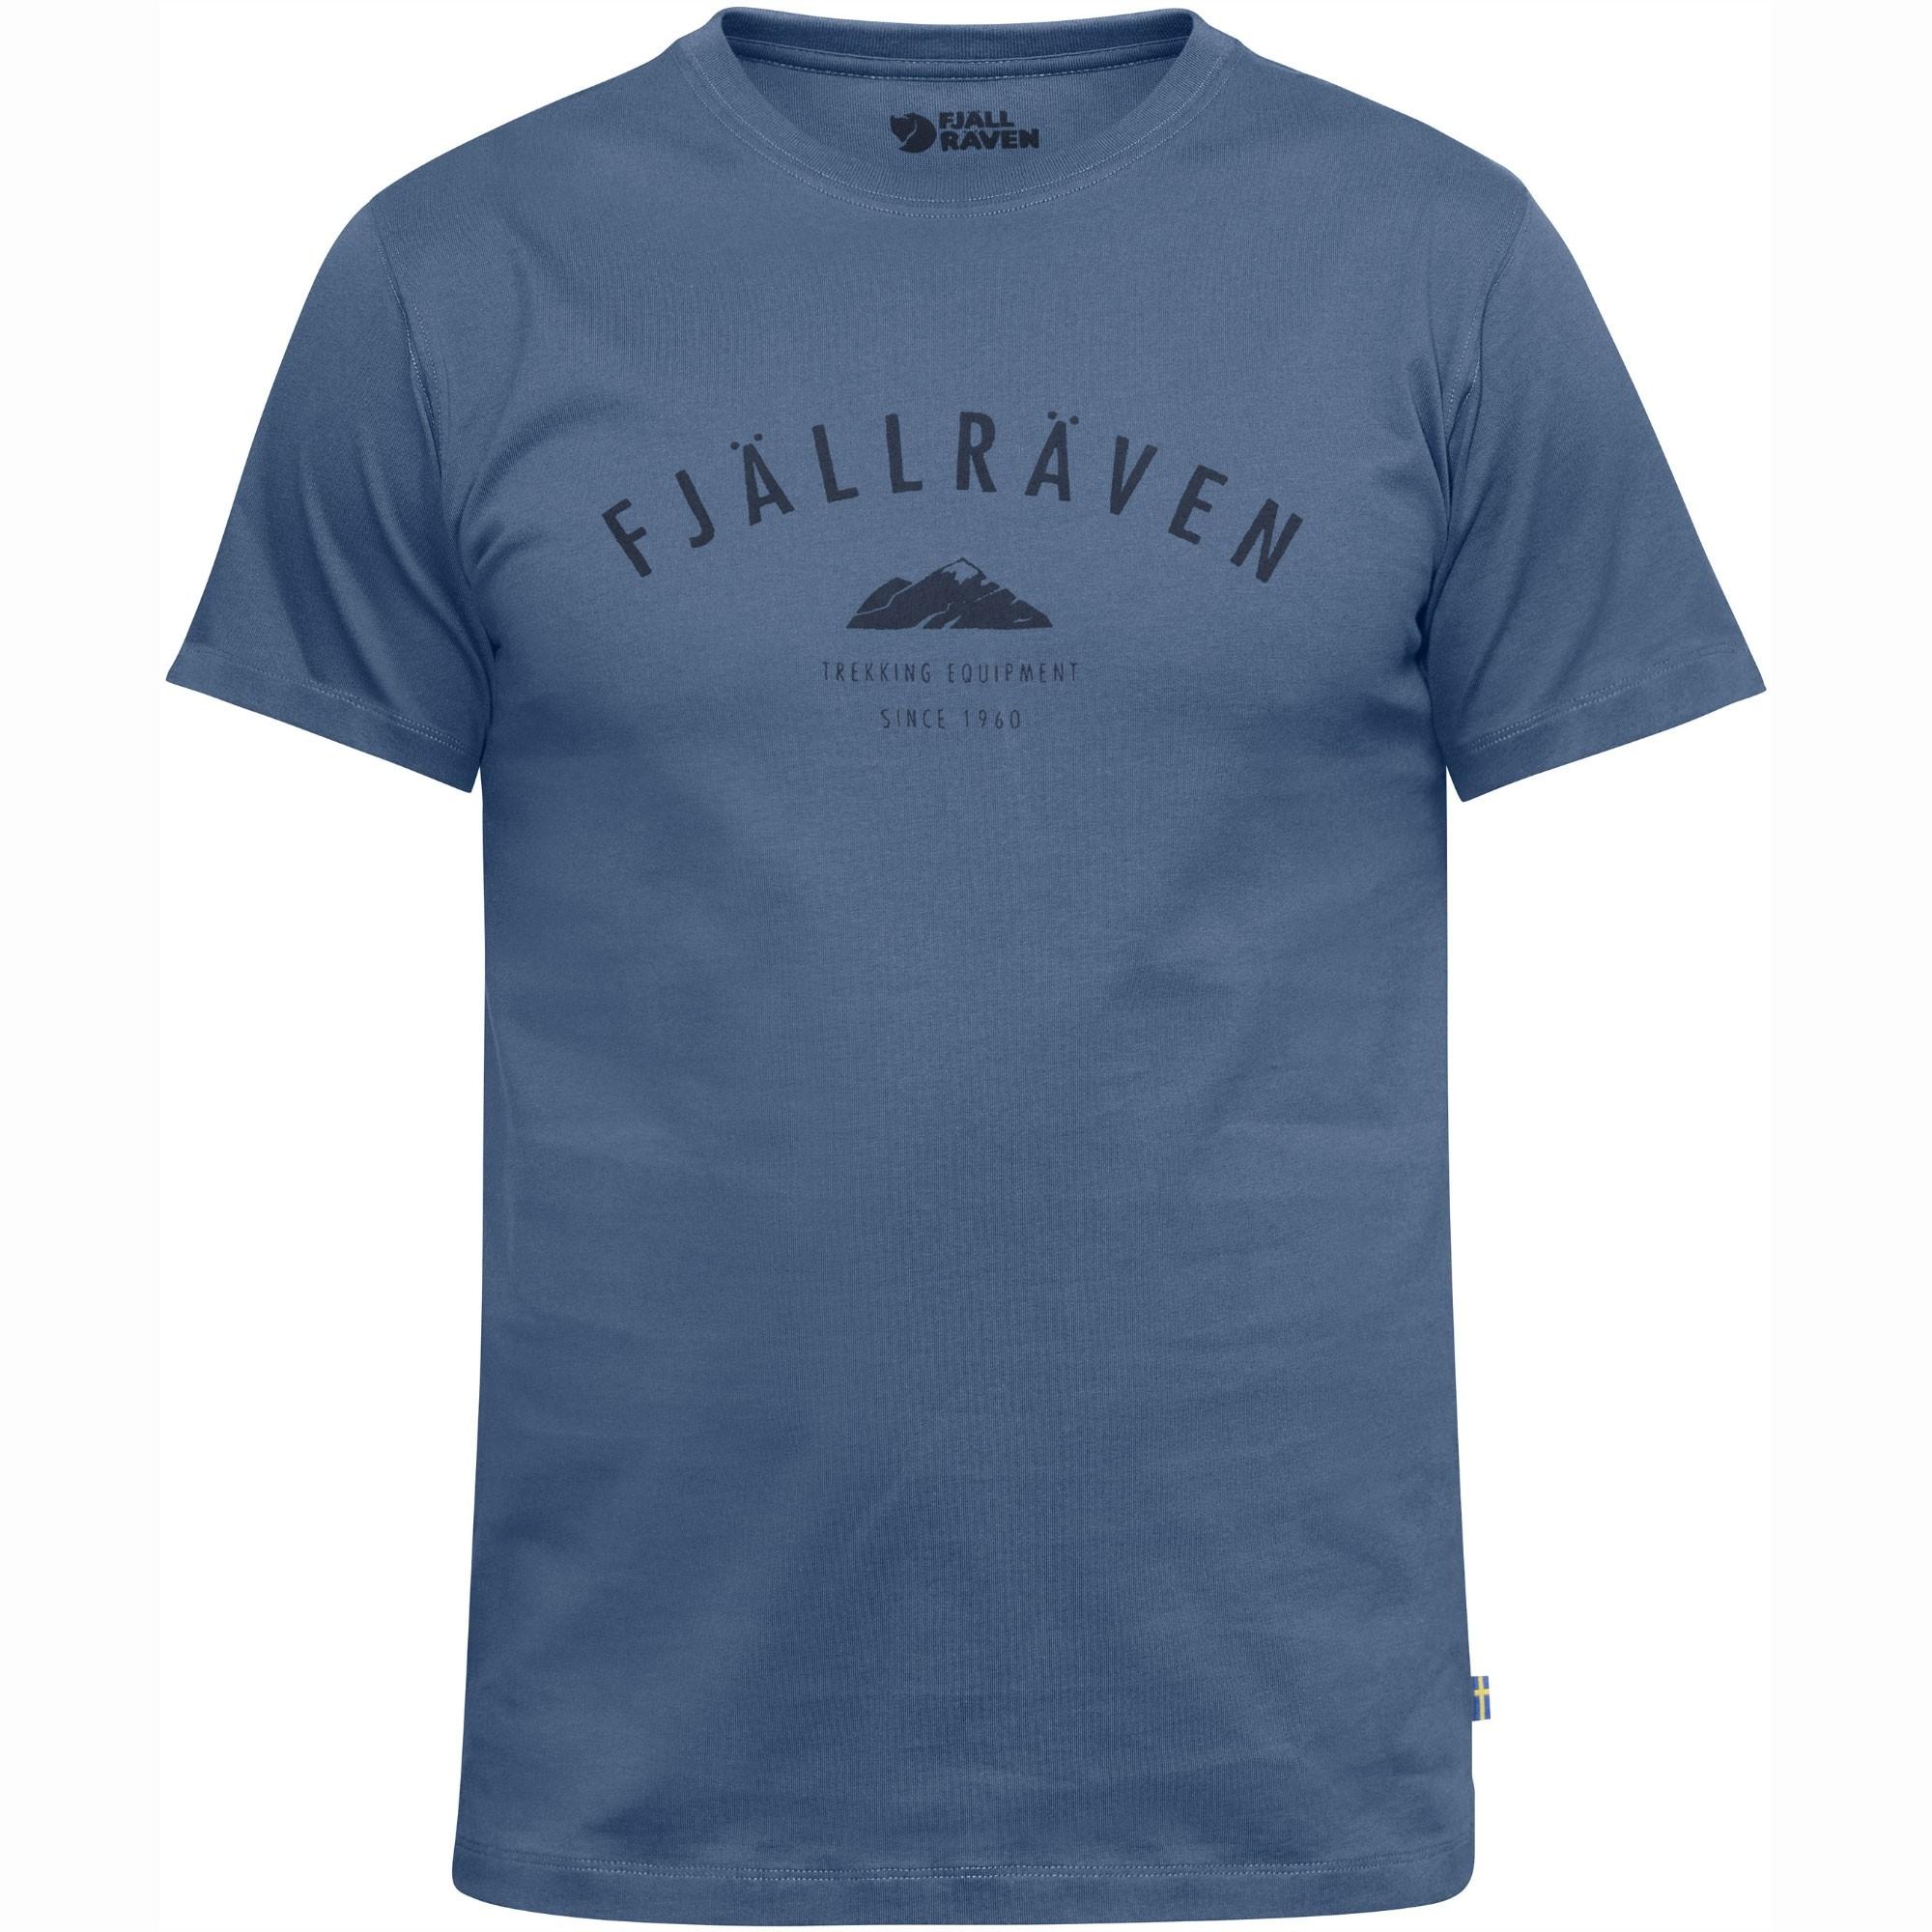 Fjallraven Trekking Equipment T-Shirt 81955 - Blue Ridge